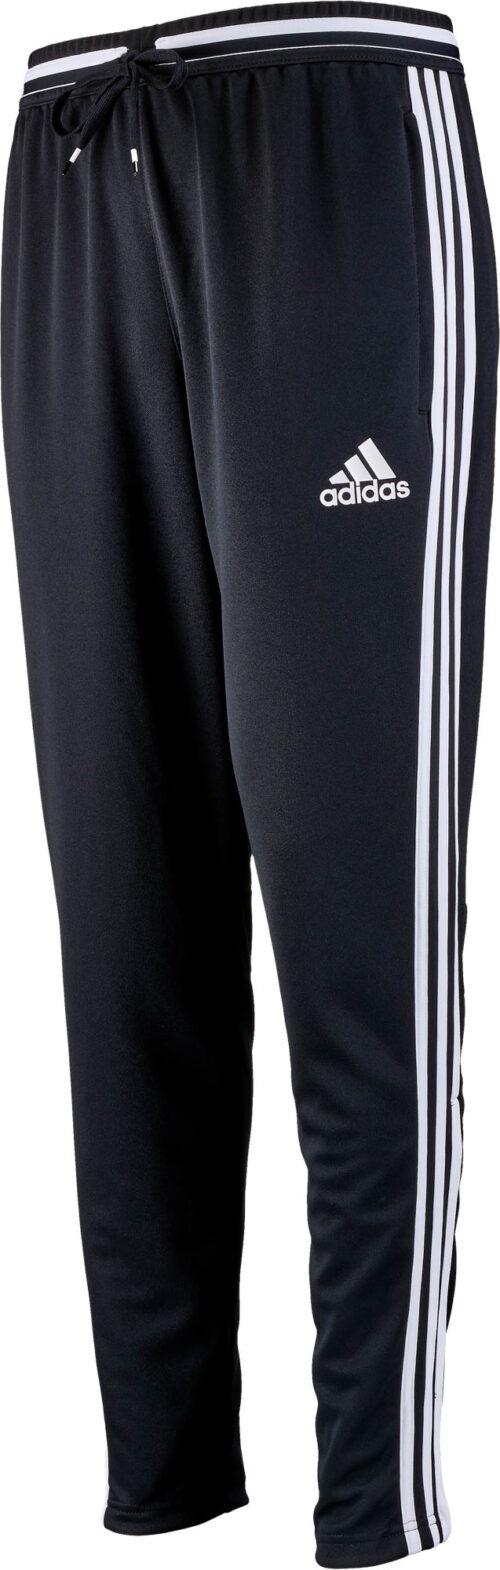 adidas Condivo 16 Training Pant – Black/White